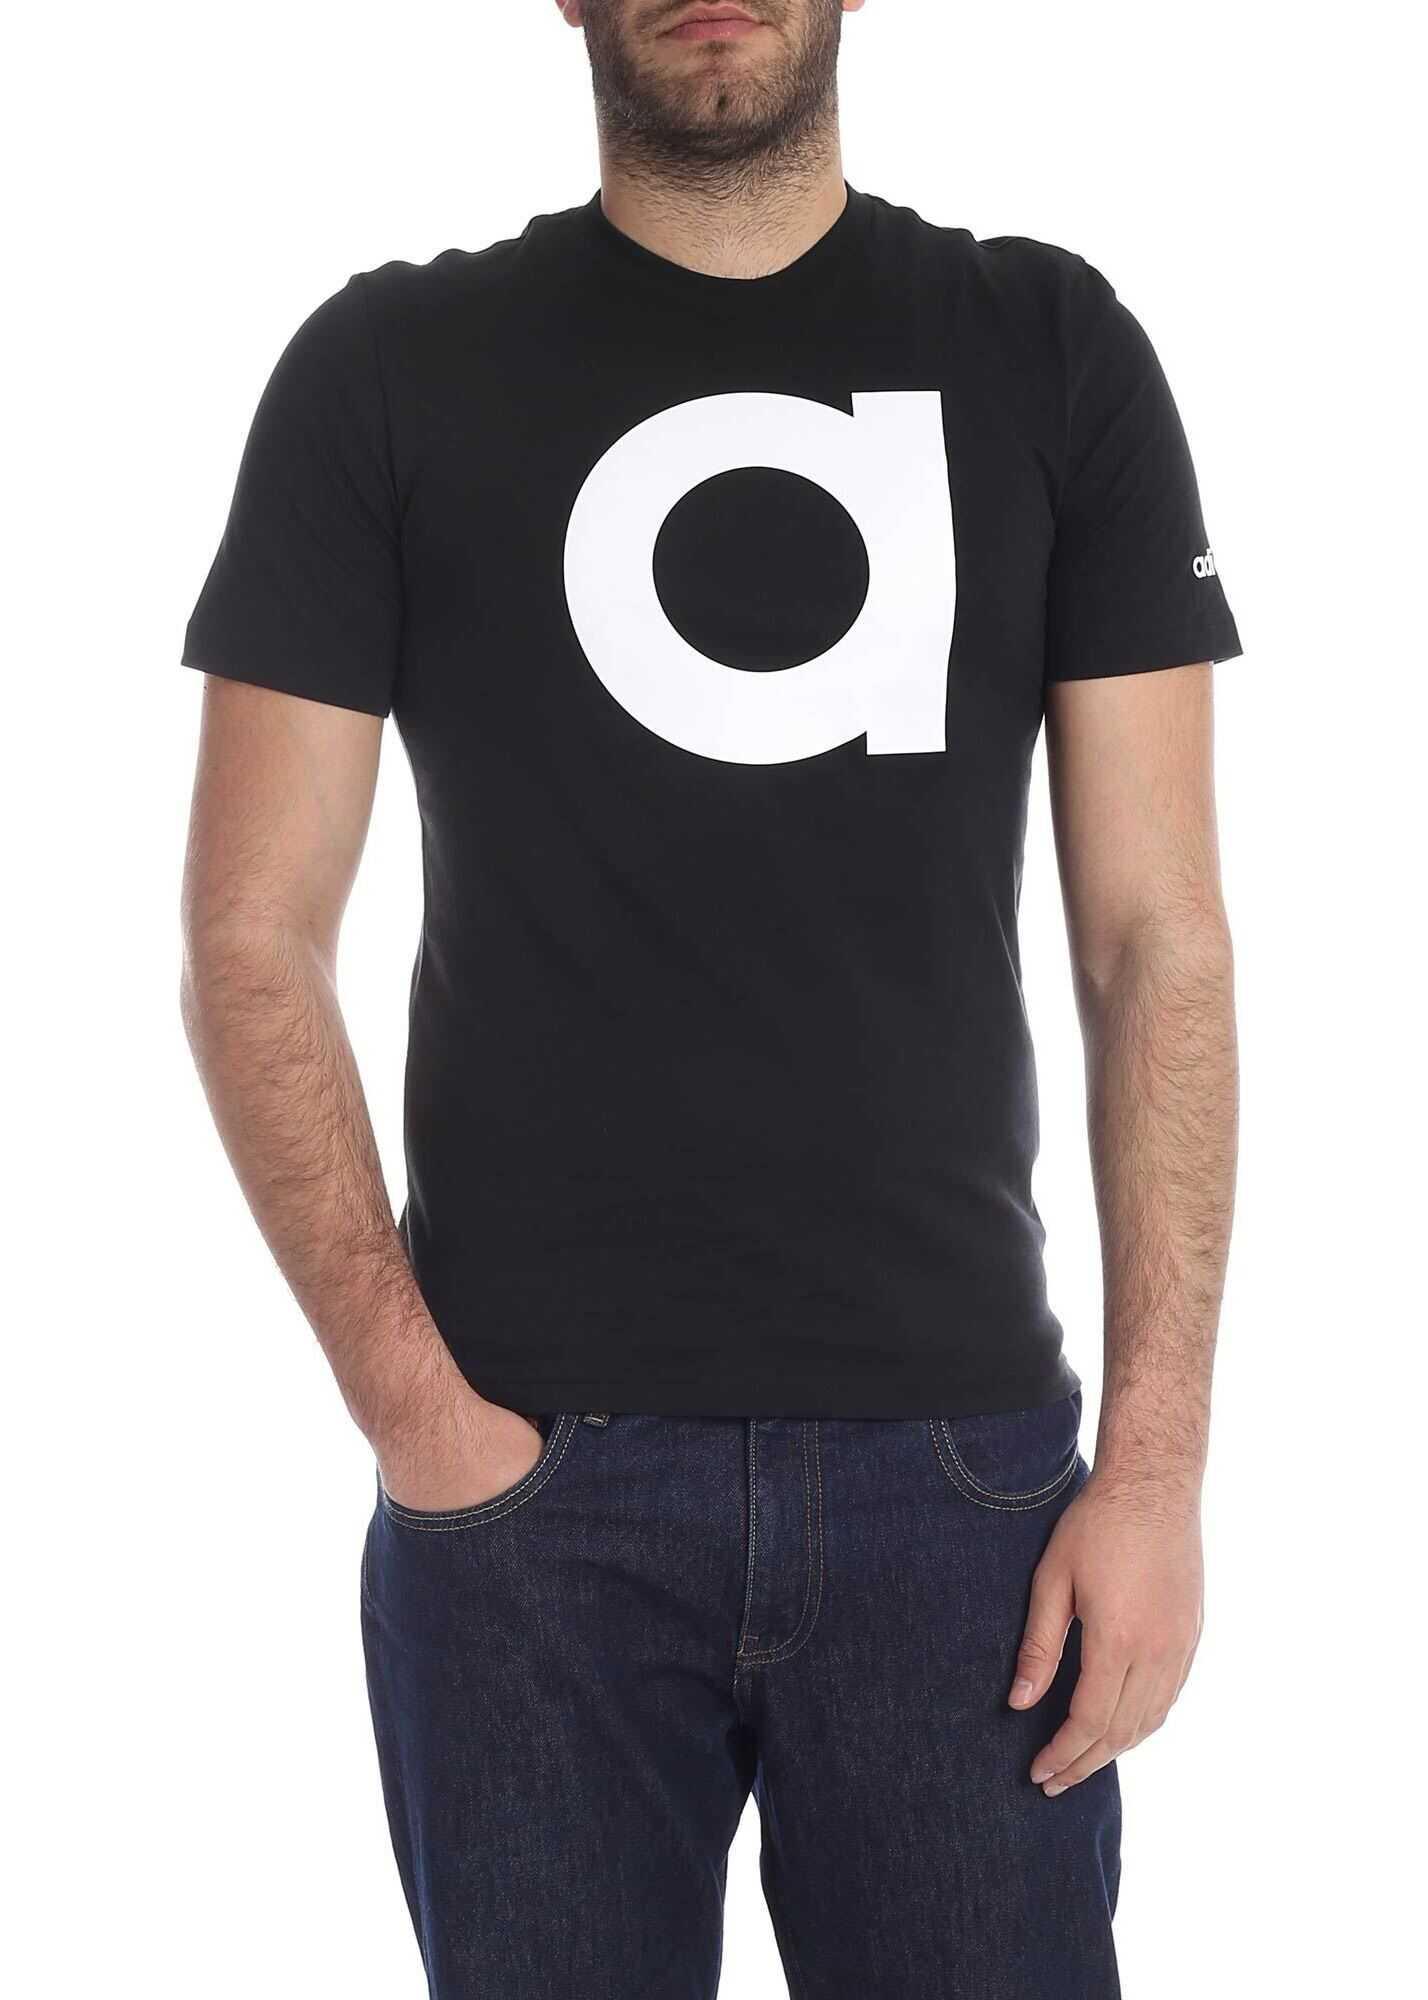 adidas Essentials T-Shirt In Black Black